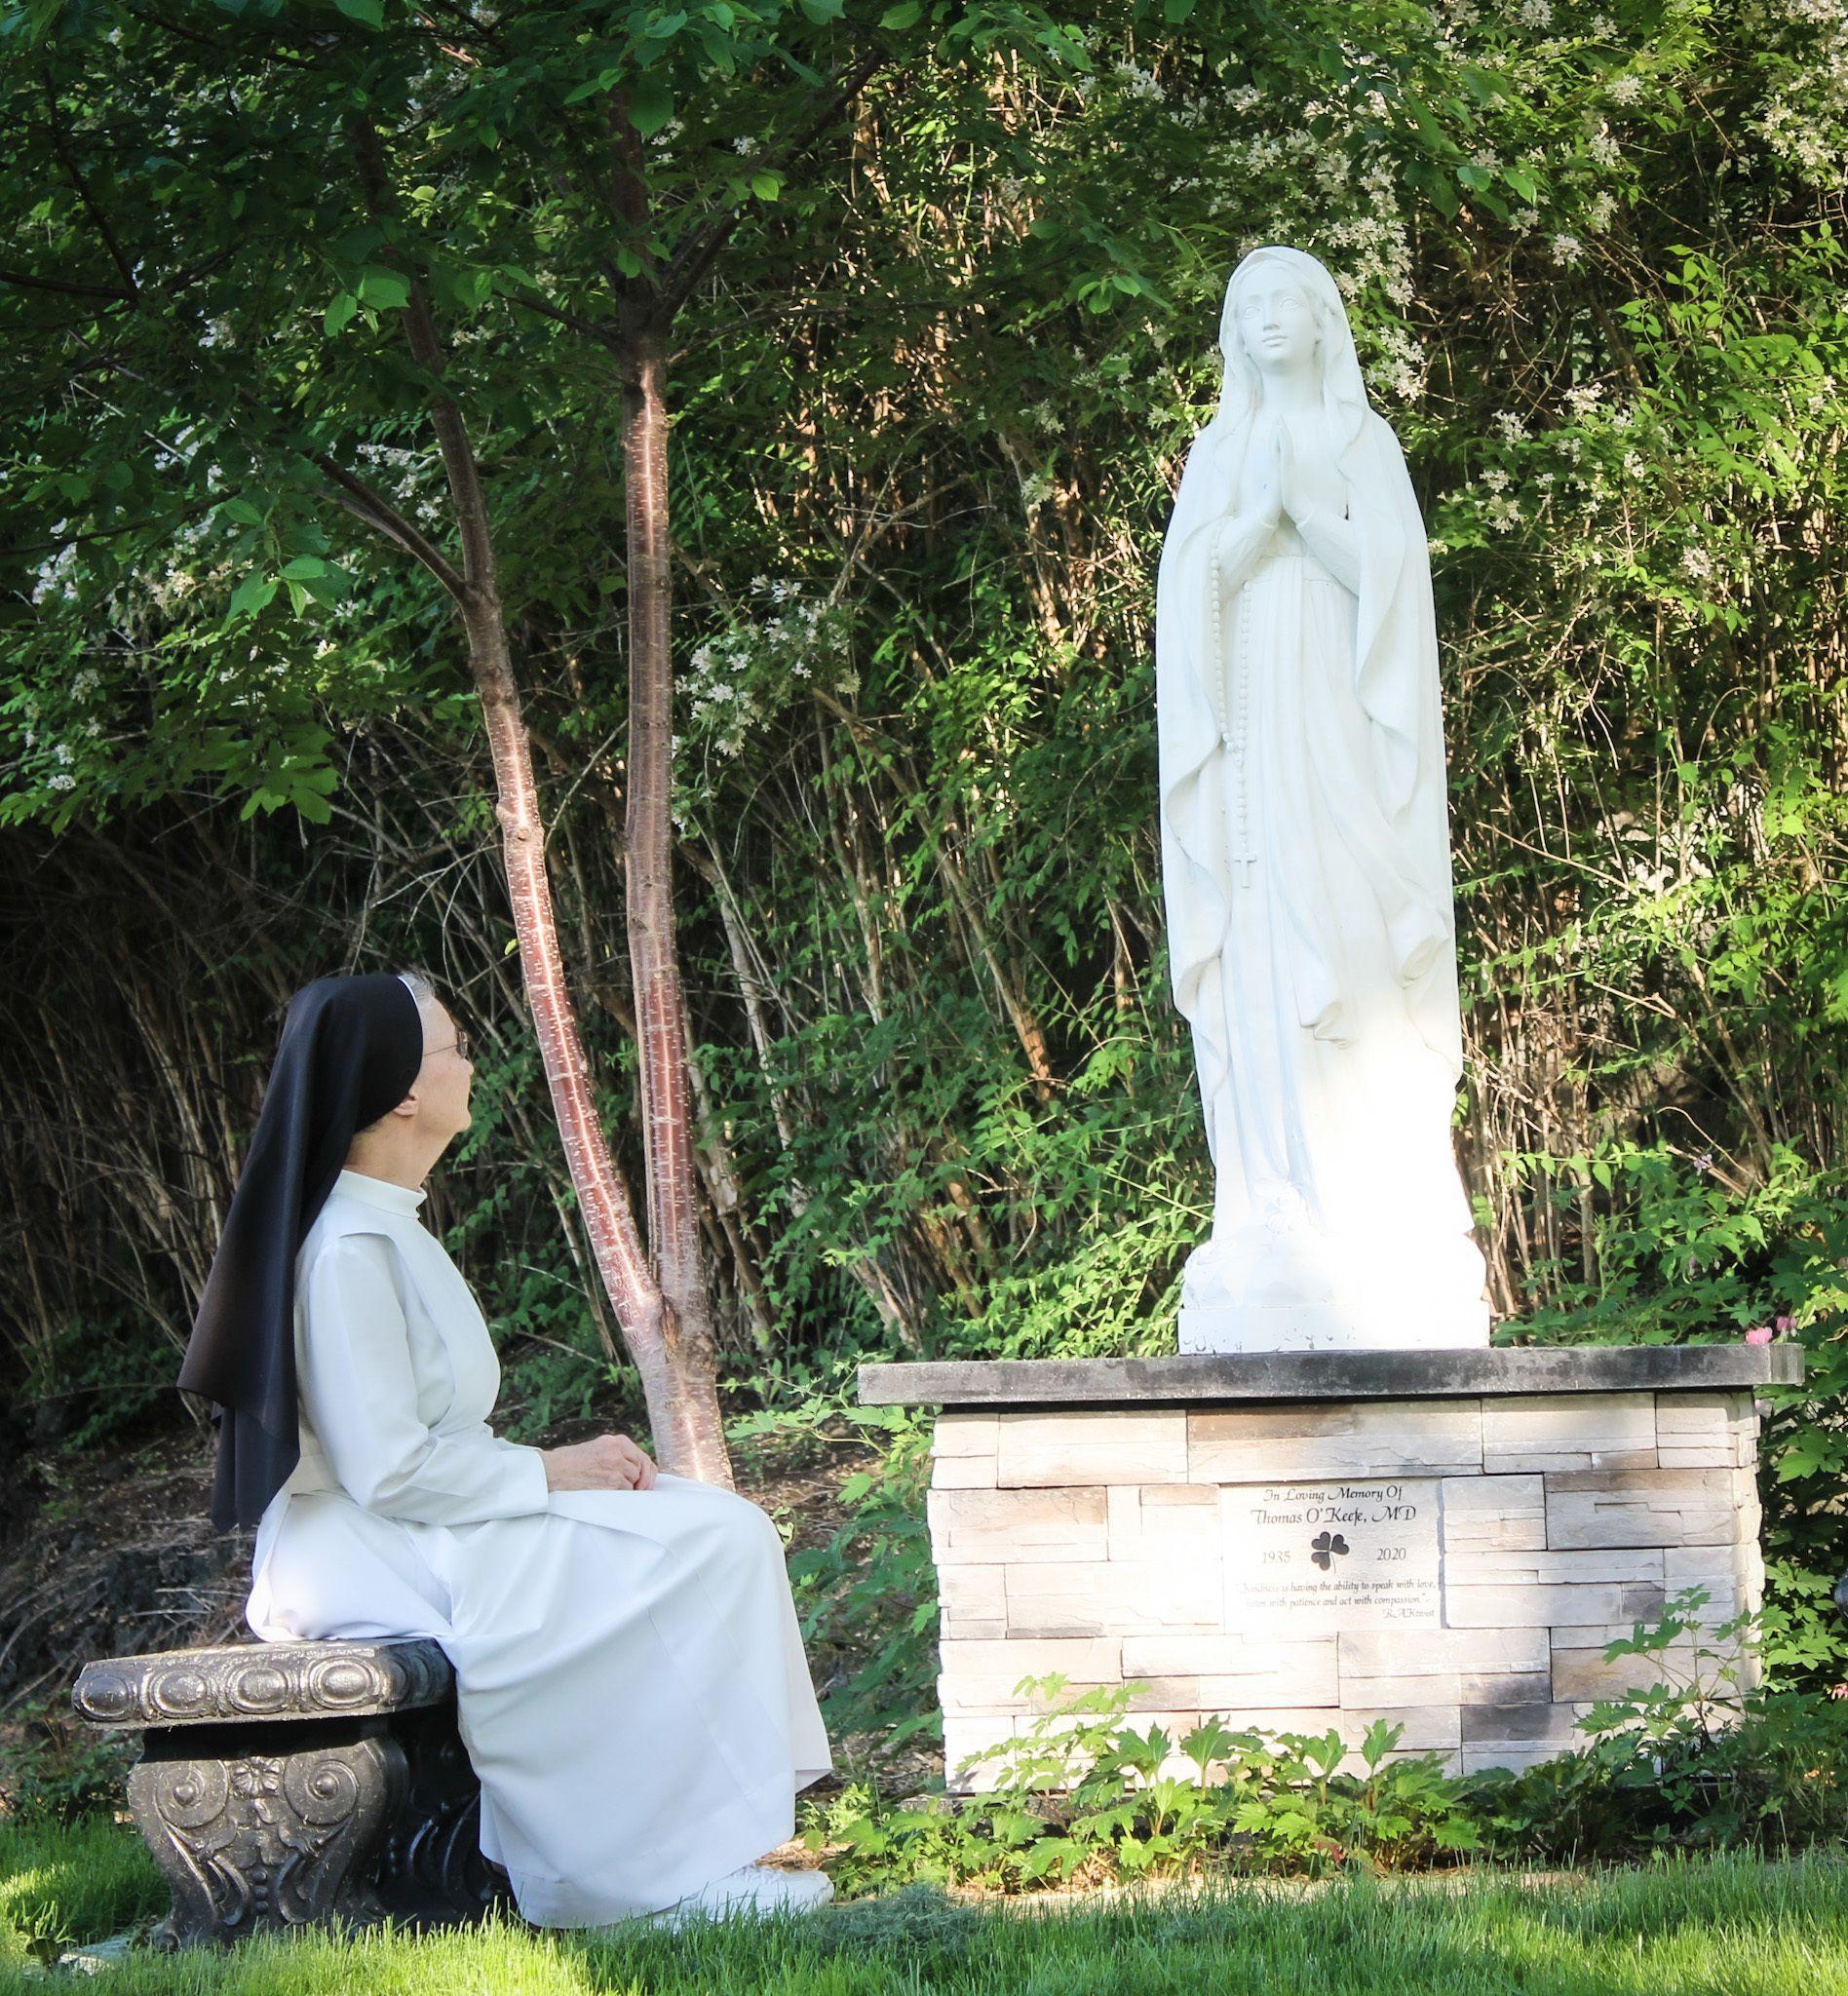 Charism of Benedictines